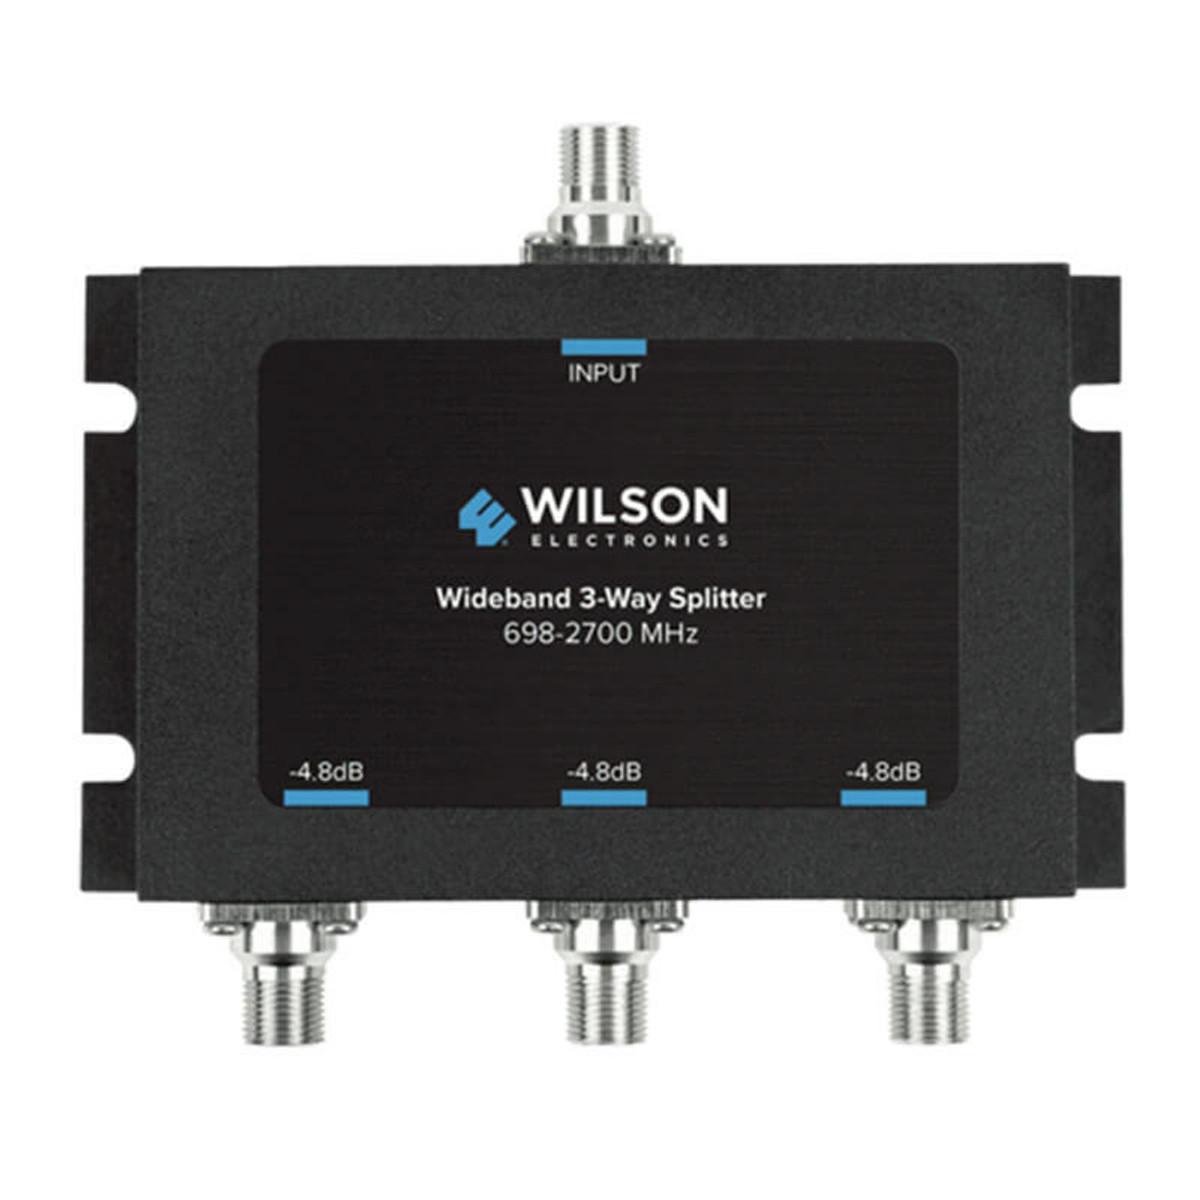 Wilson Electronics -4.8db 3-way Splitter for 698-2700 MHz 75ohm | 850035